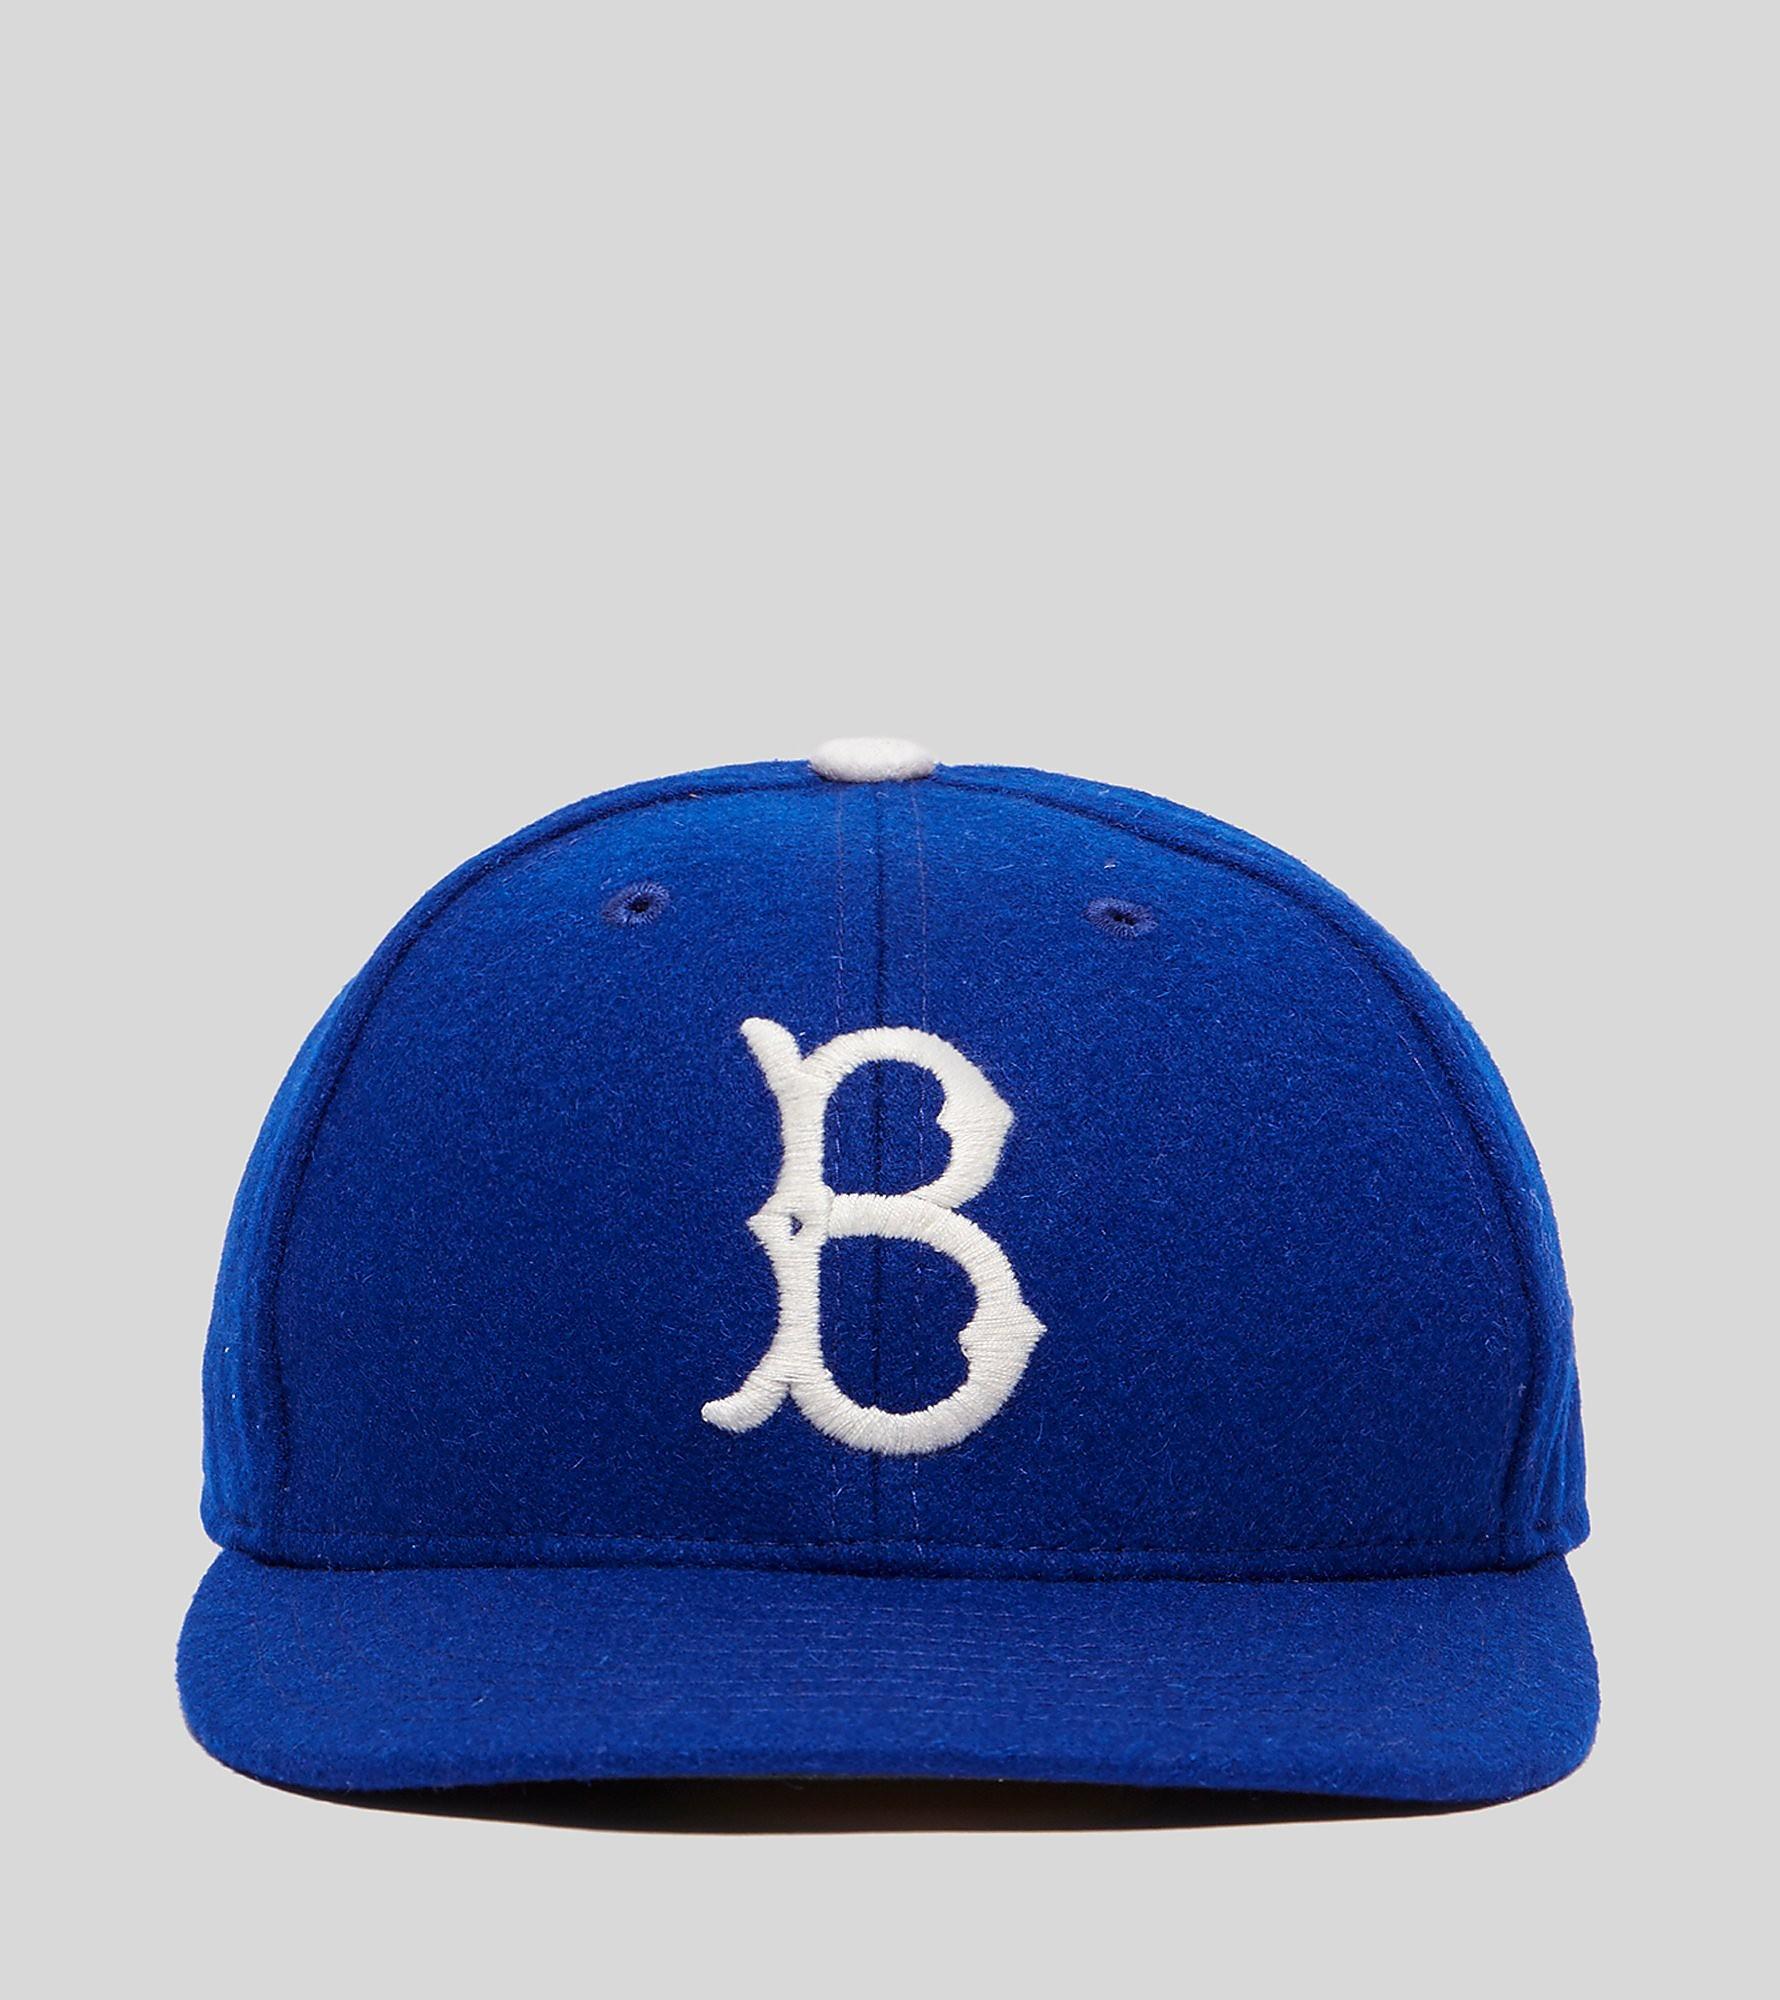 New Era 59FIFTY Low Profile Brooklyn Dodgers Cap